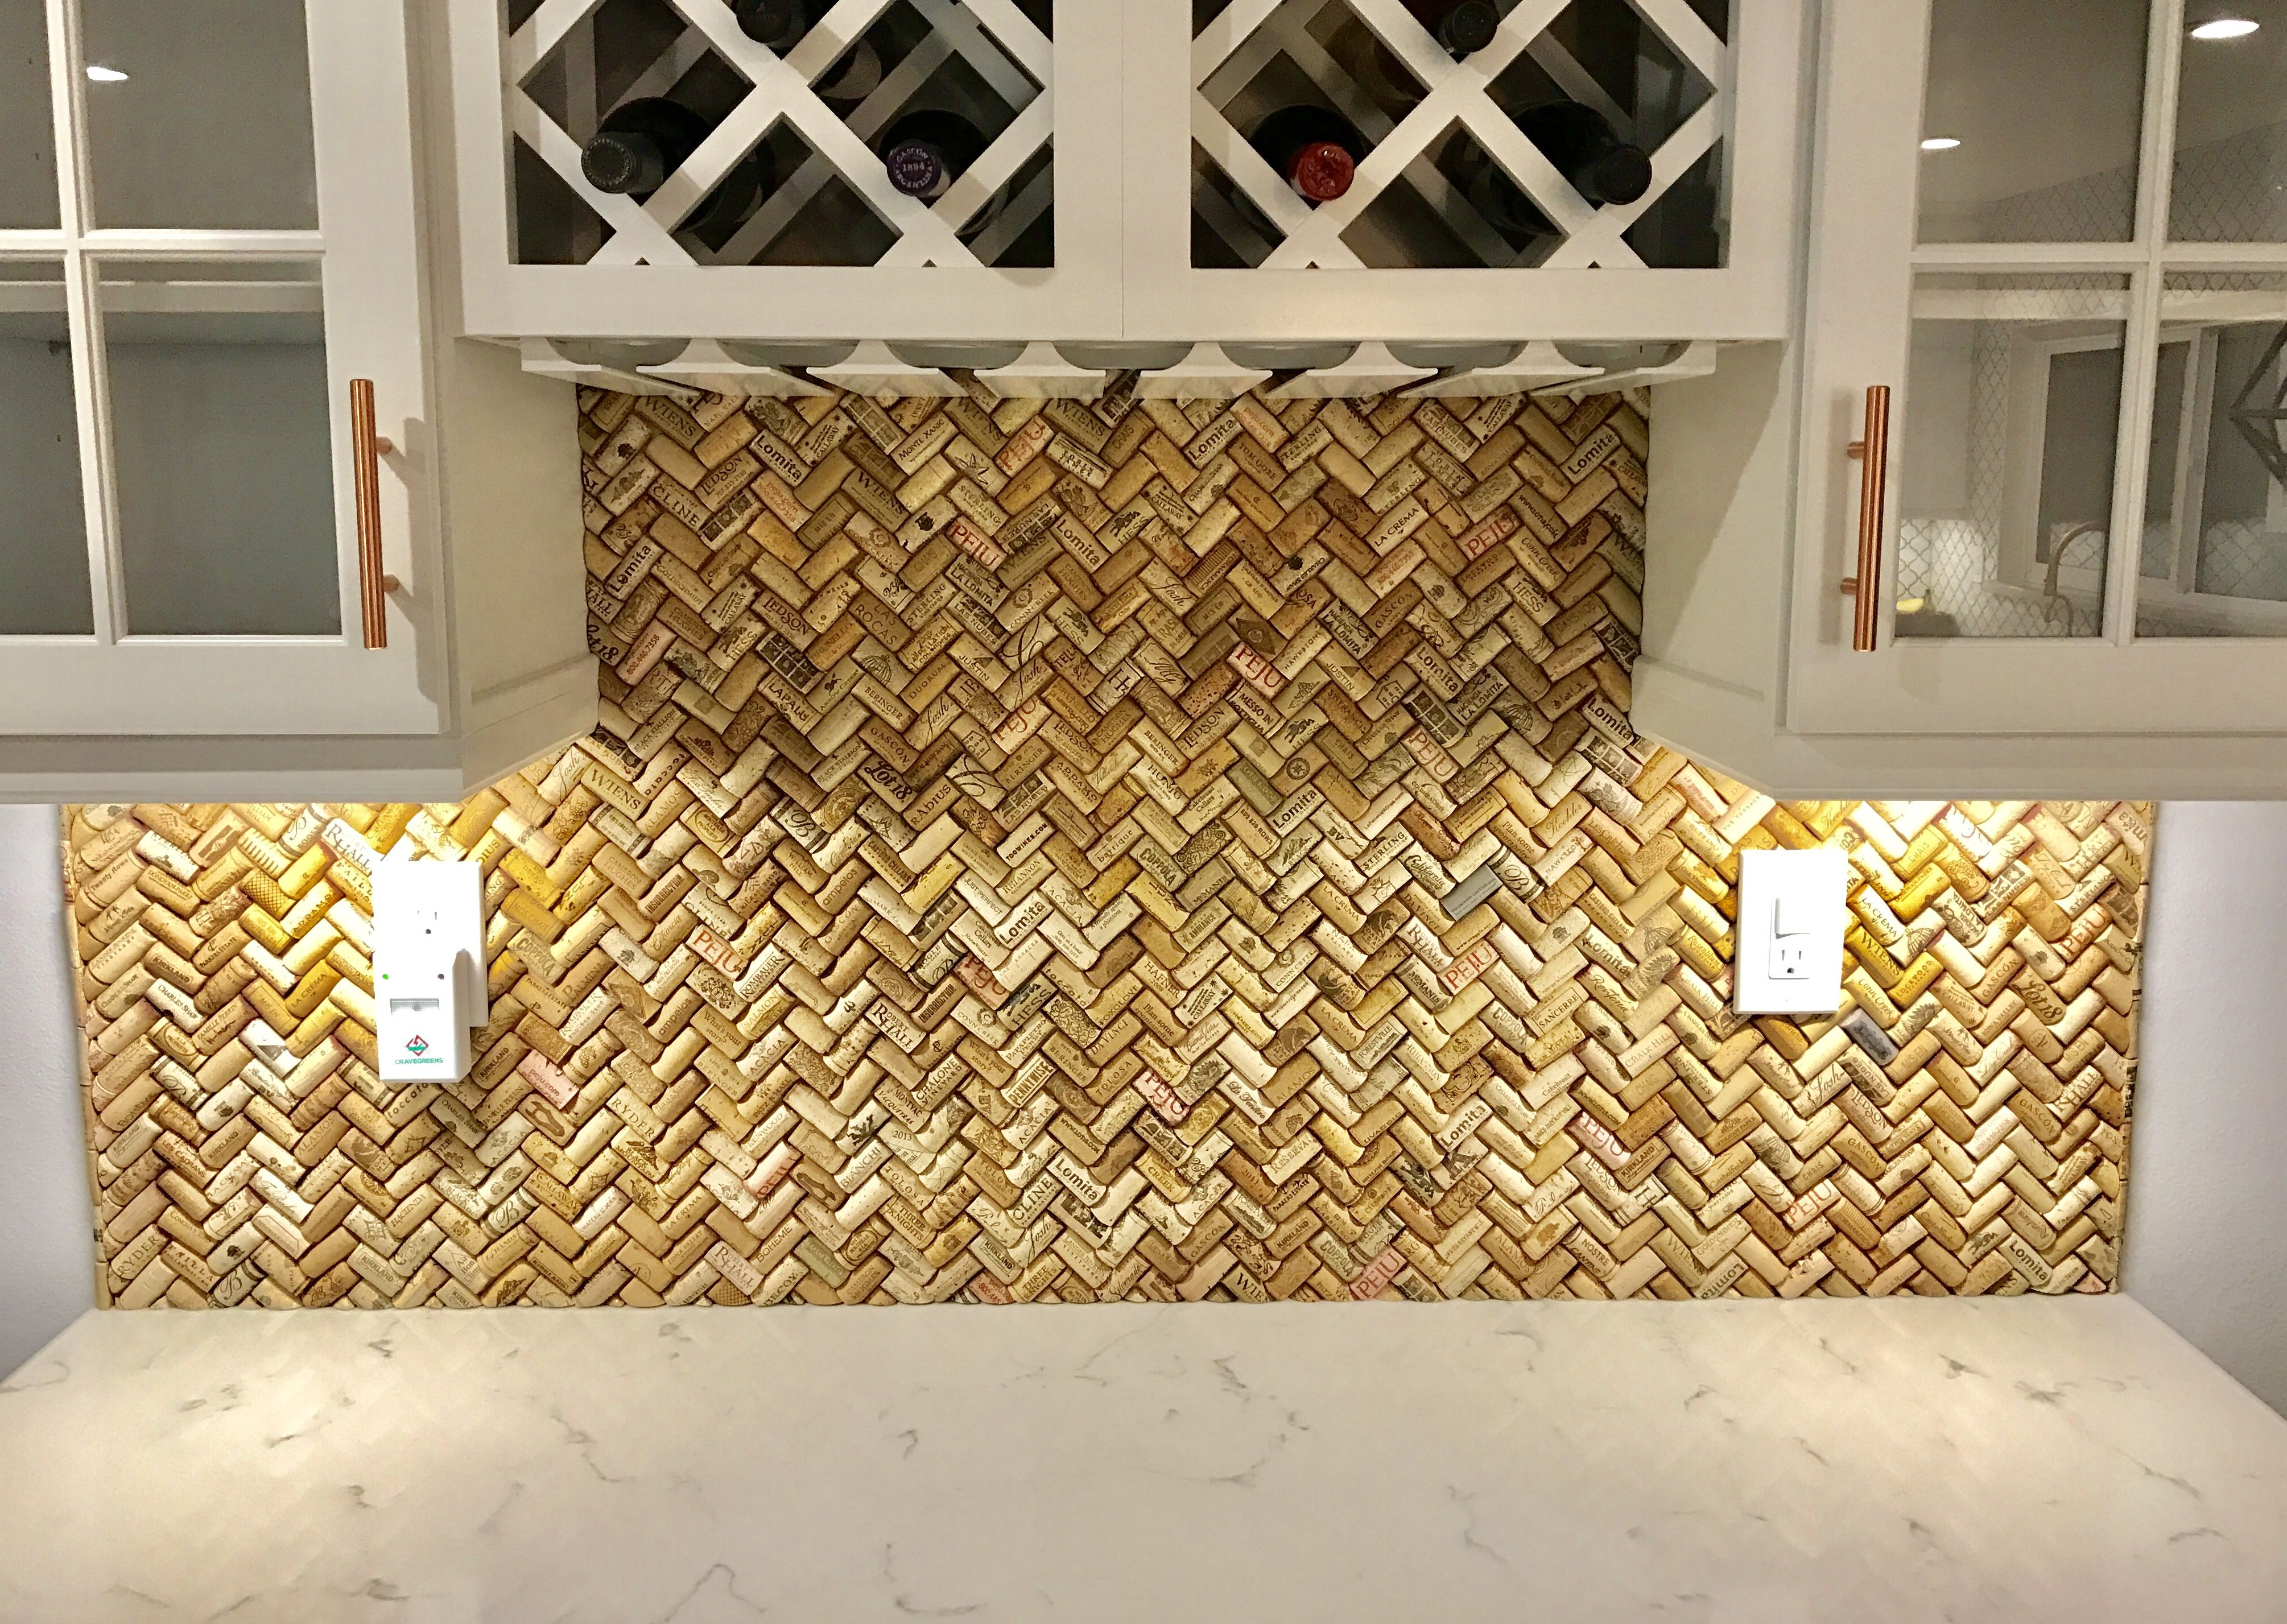 Cork Backsplash Wine Projects Crafts Homemade Bench Tiles